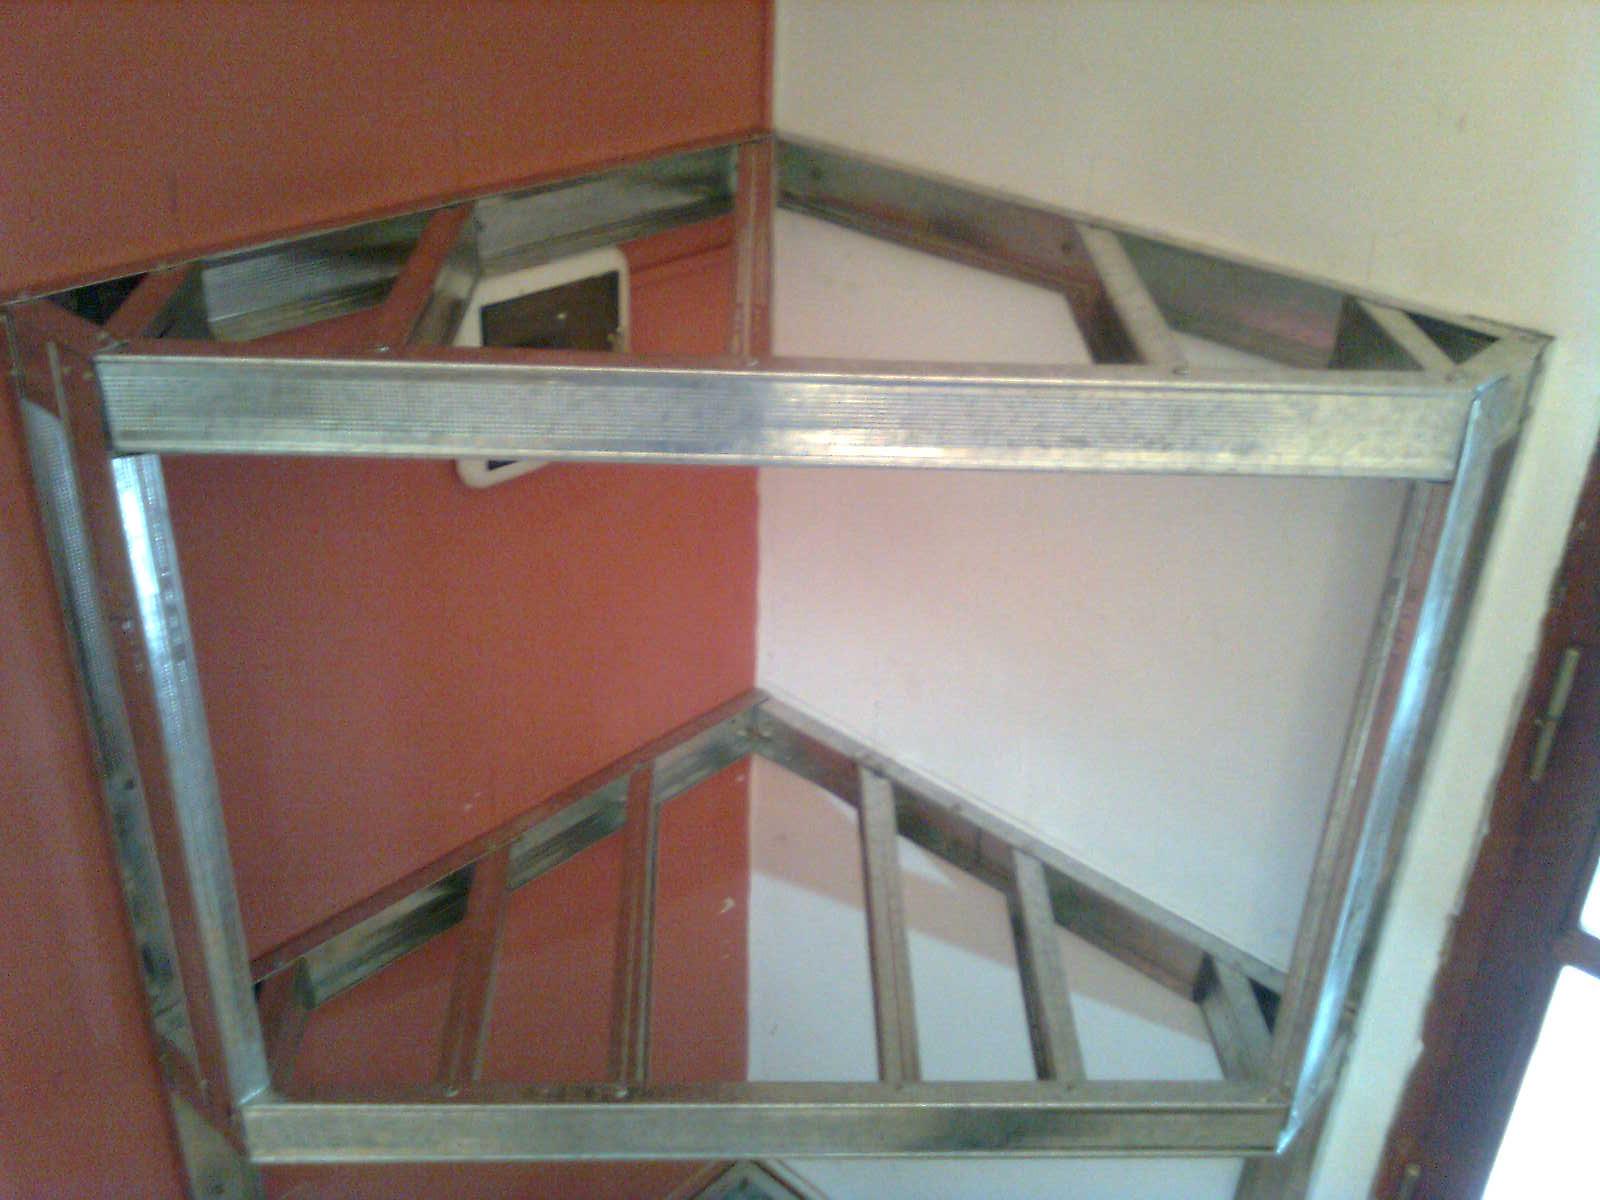 fotos de muebles de durlock para lcd - Modular Durlock